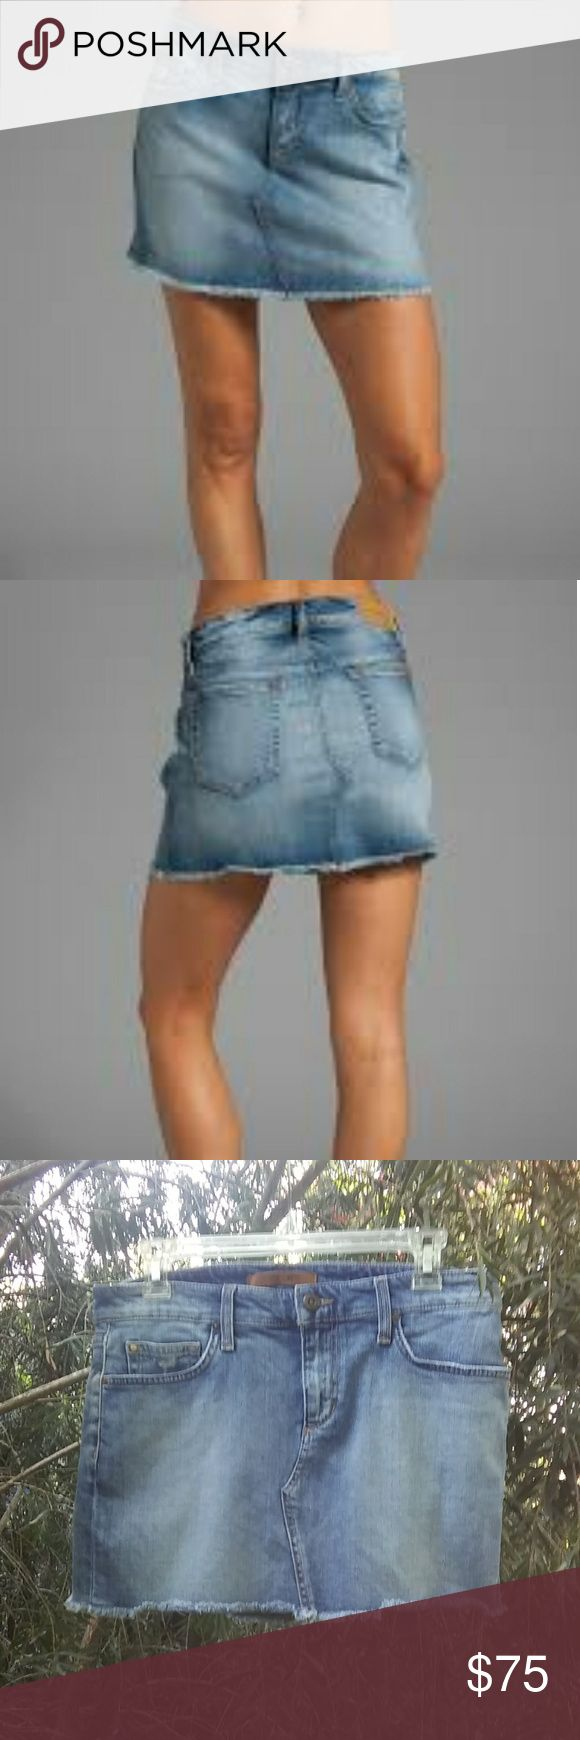 "Joe's Jeans Mini Skirt Vintage Reserve 1971 Joe's Jeans Mini Skirt Vintage Reserve 1971. Excellent pre-owned condition, like new! W 27, 13"" L in front, 13 1/2' L in back. Joe's Jeans Skirts Mini"